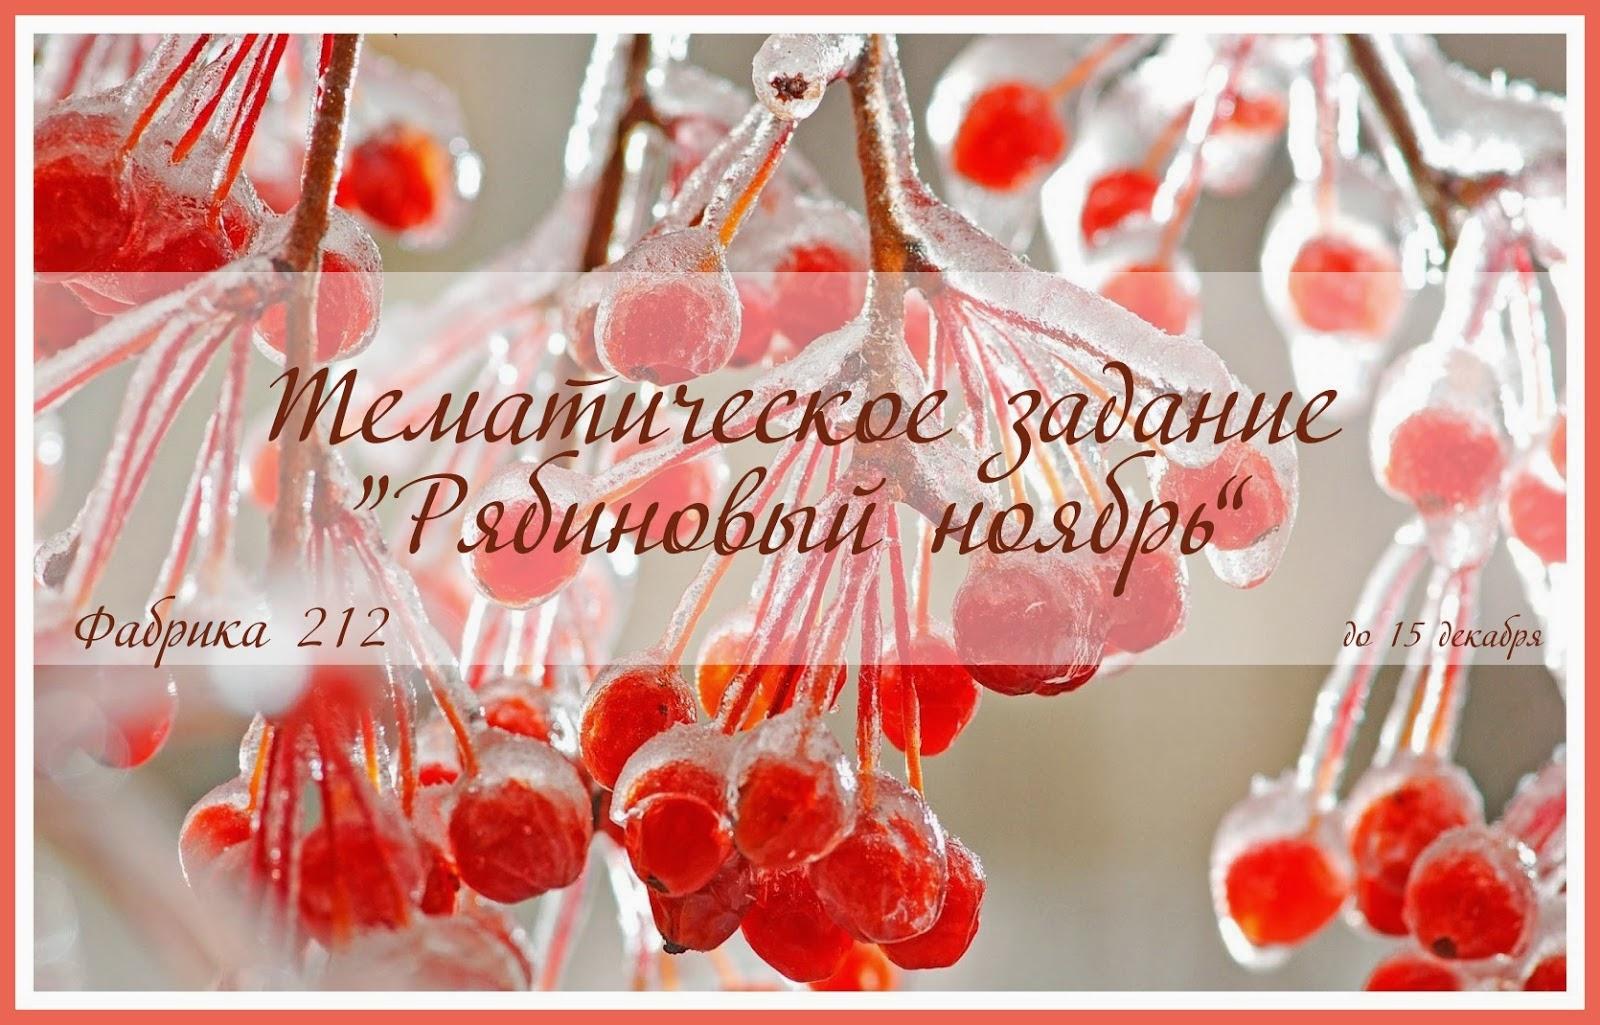 http://fabrika212.blogspot.ru/2014/11/blog-post_15.html